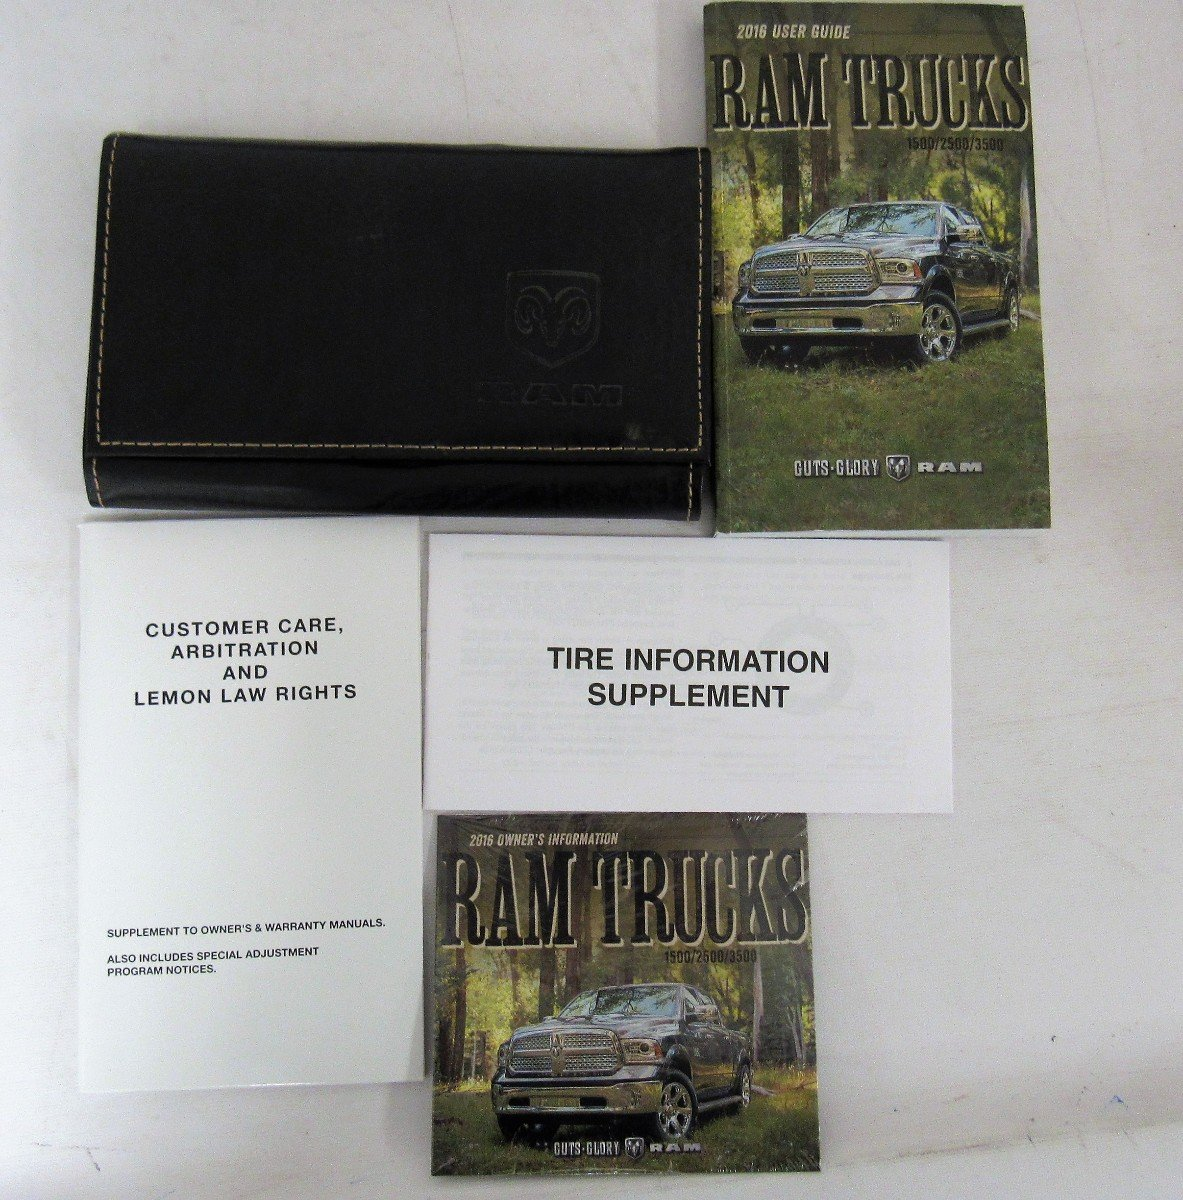 2017 Dodge Ram 1500 2500 3500 Owners Manual User Guide Set: Dodge:  7426817596704: Amazon.com: Books